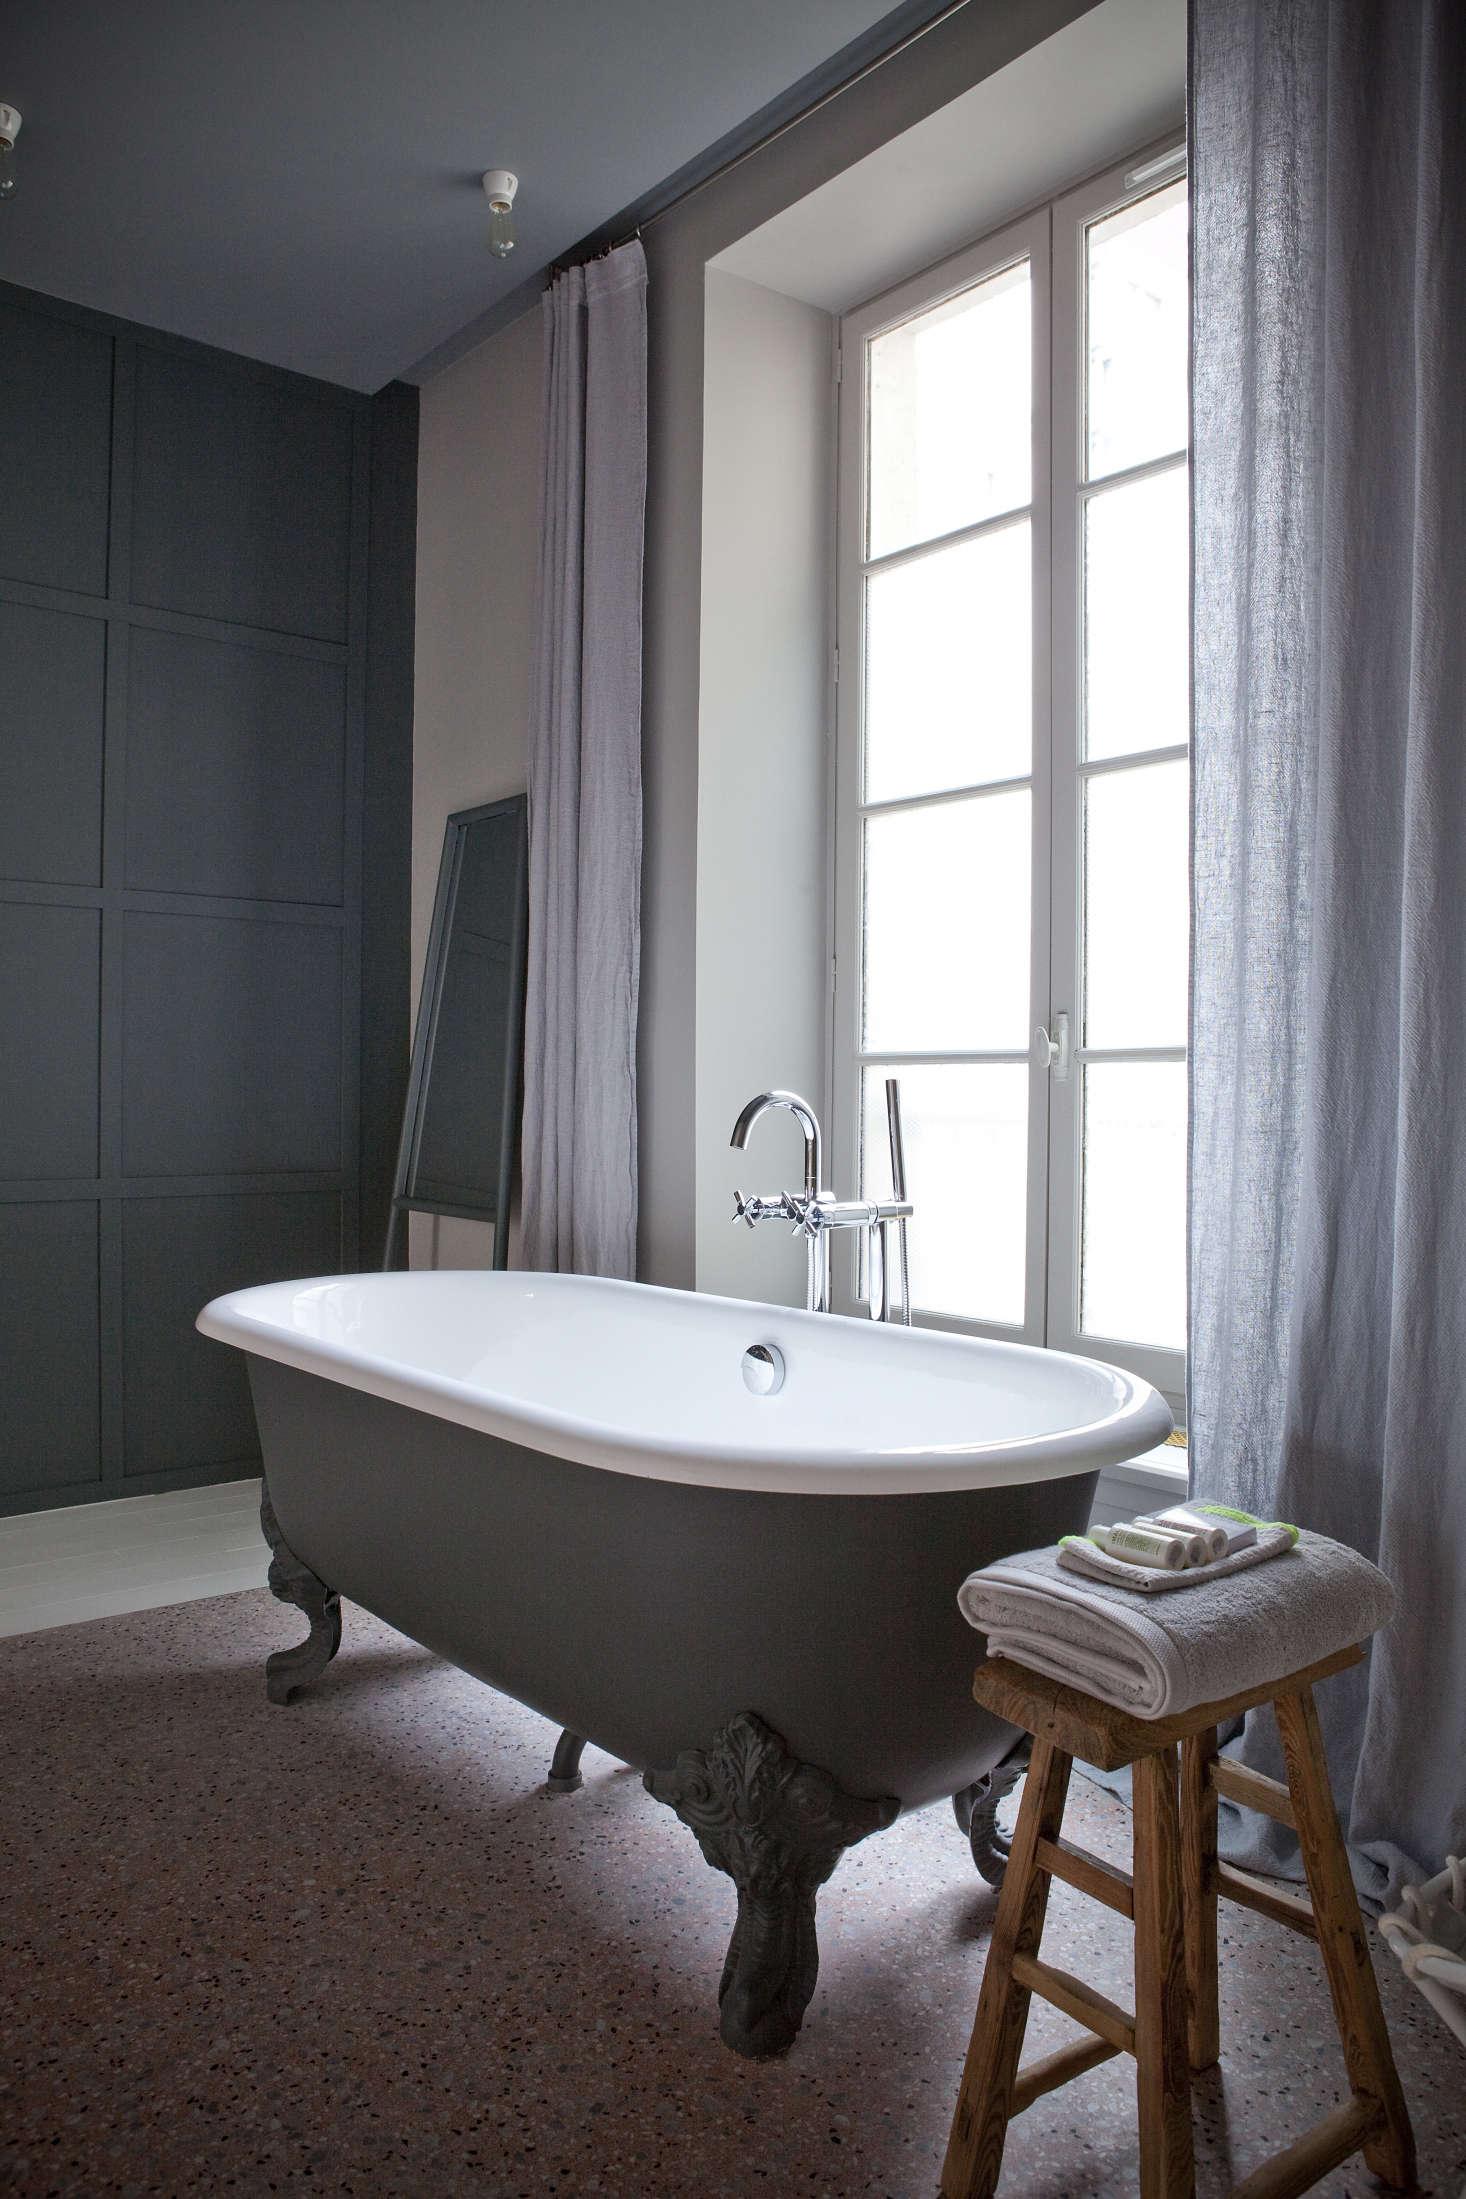 Chez-Marie-Sixtine-Paris-Remodelista-Julie-Ansiau-photo-16